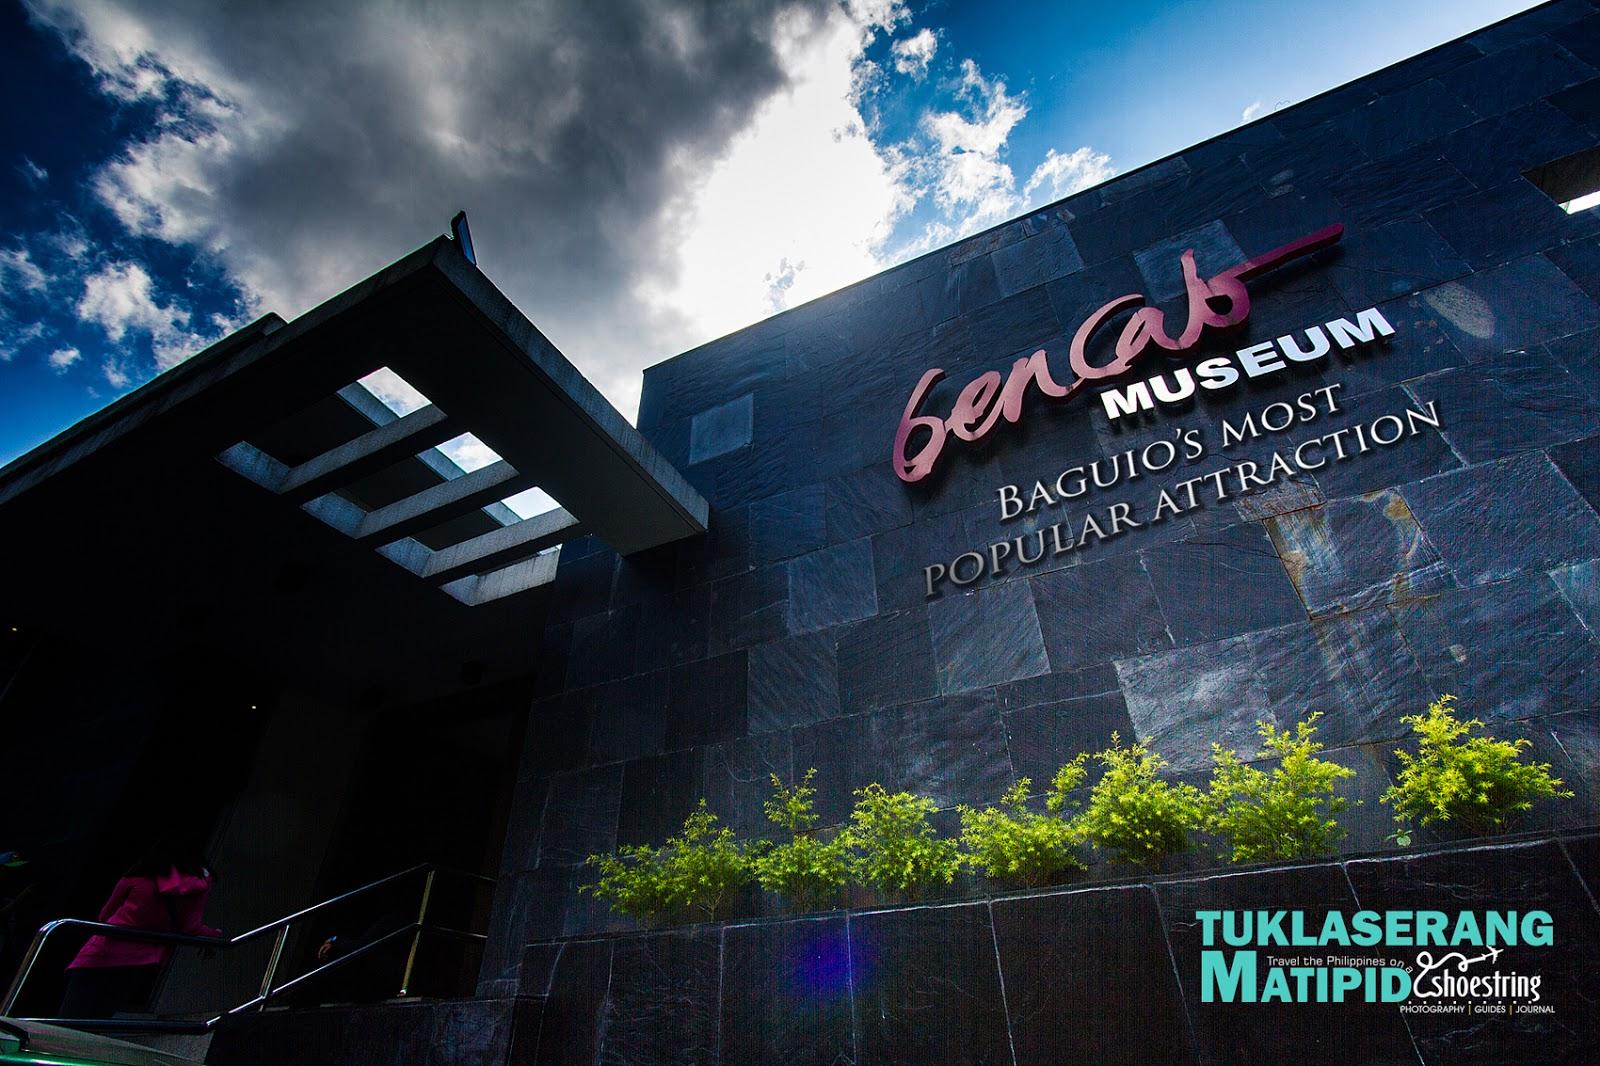 Ben Cab Museum Benguet